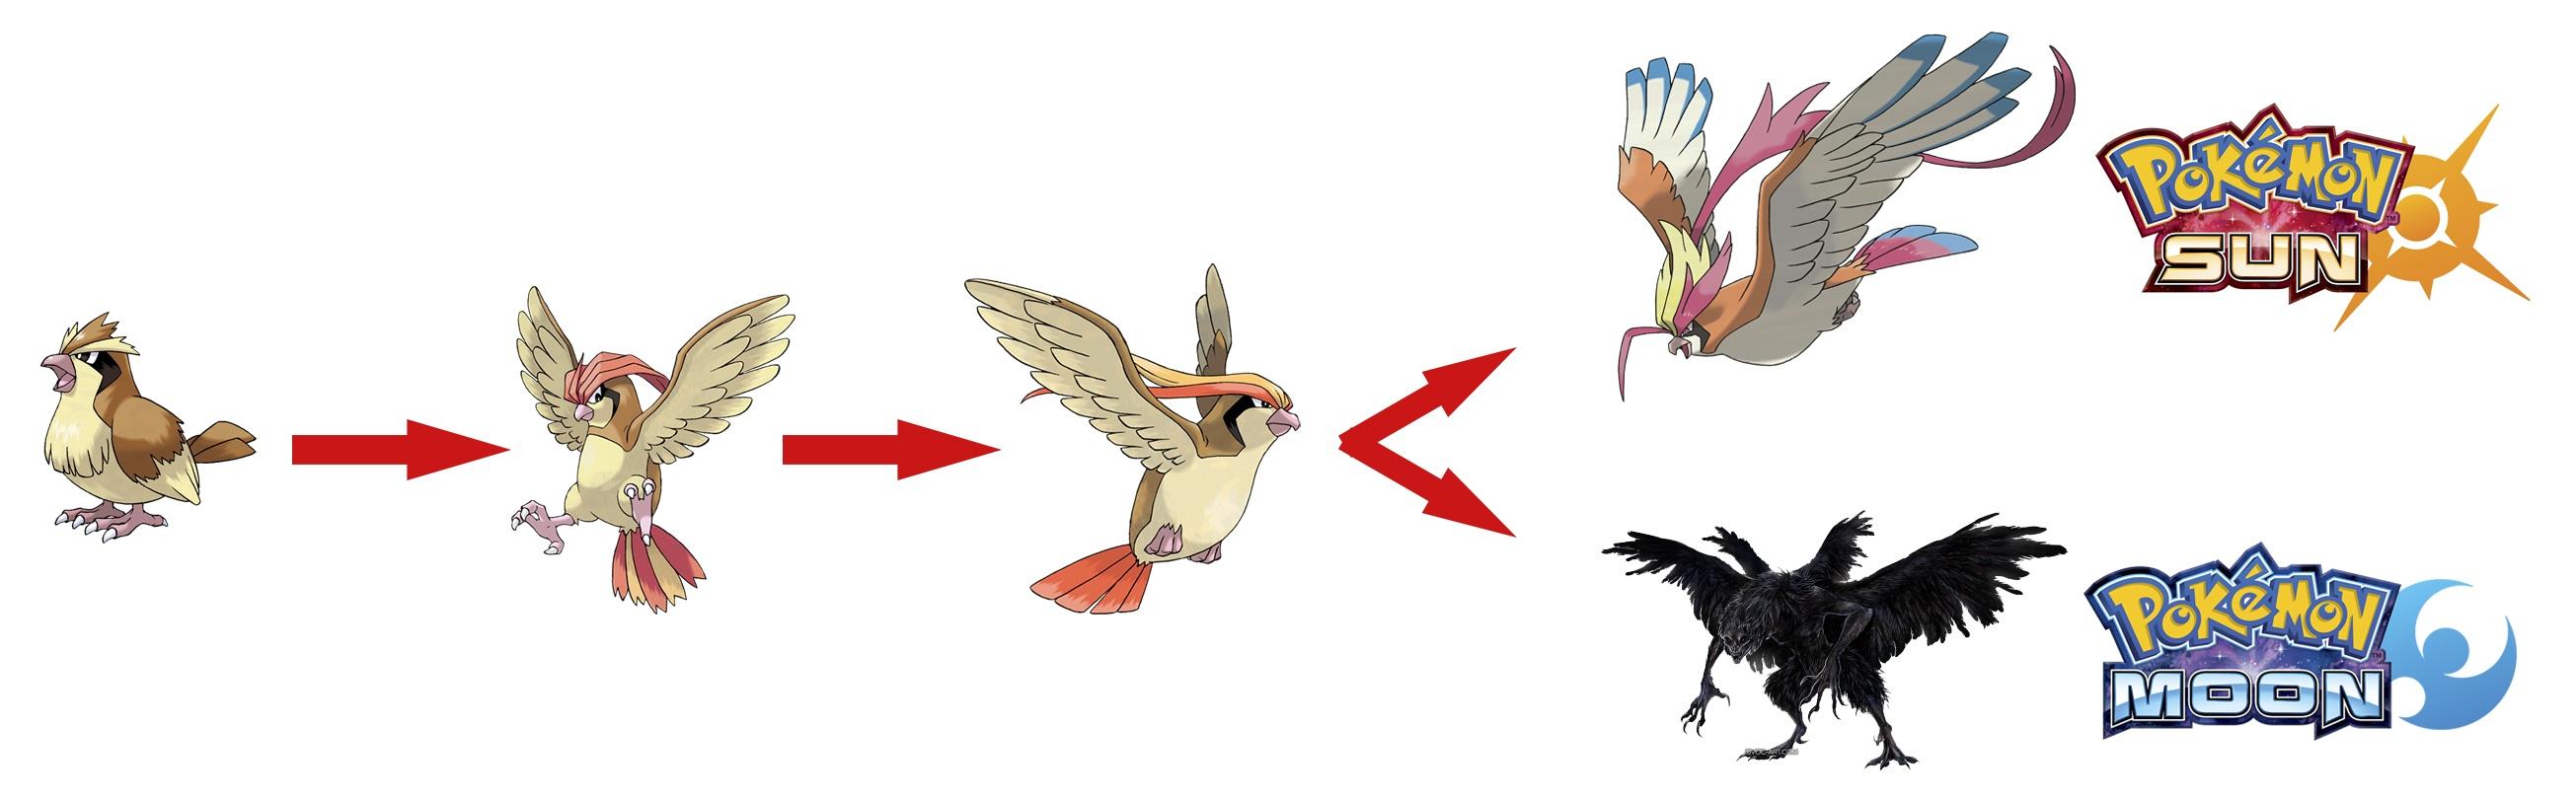 armsmy-pokemon-pidgeot-dark-souls-pn